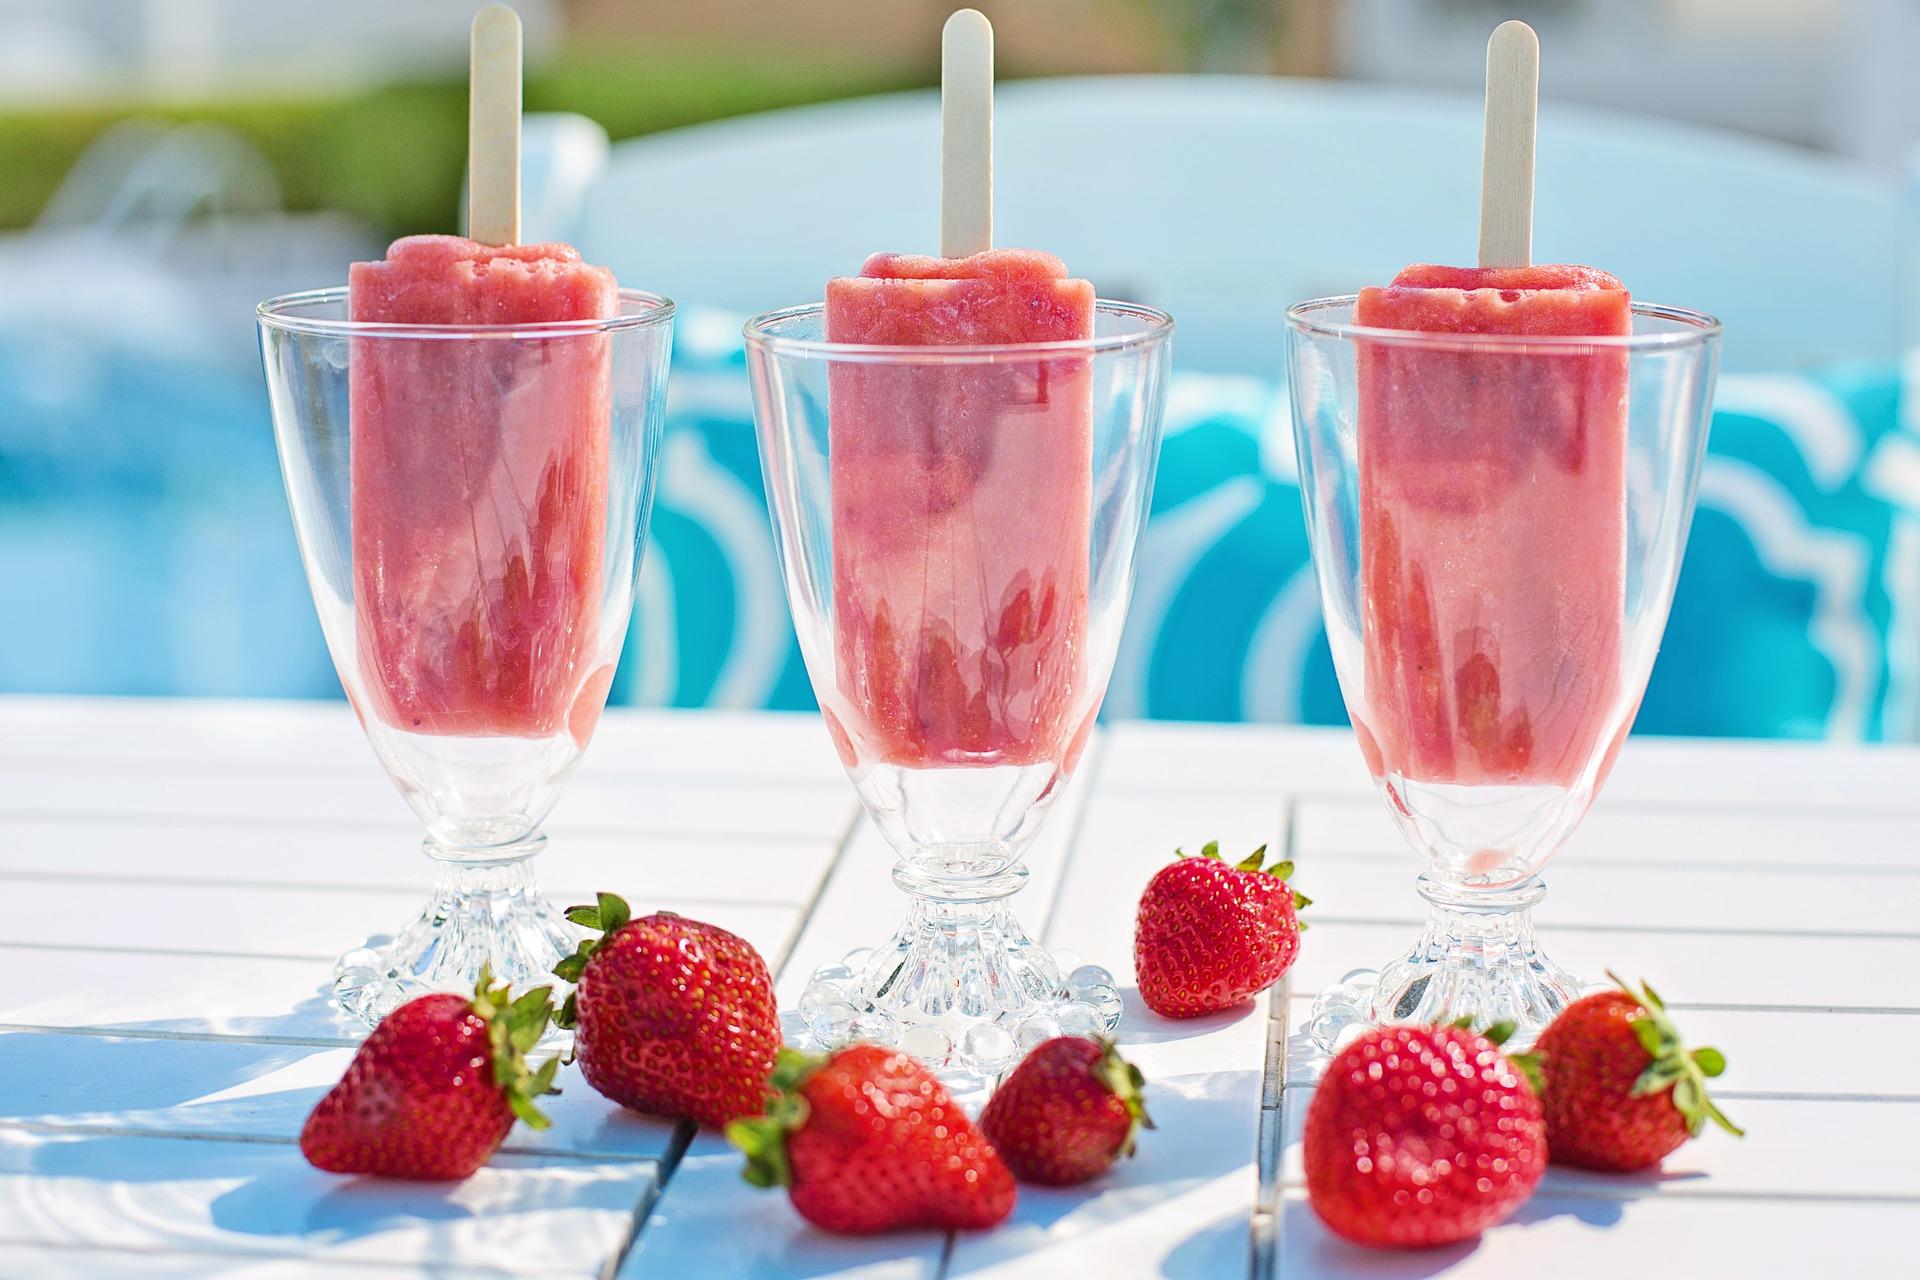 ghiaccioli e fragole